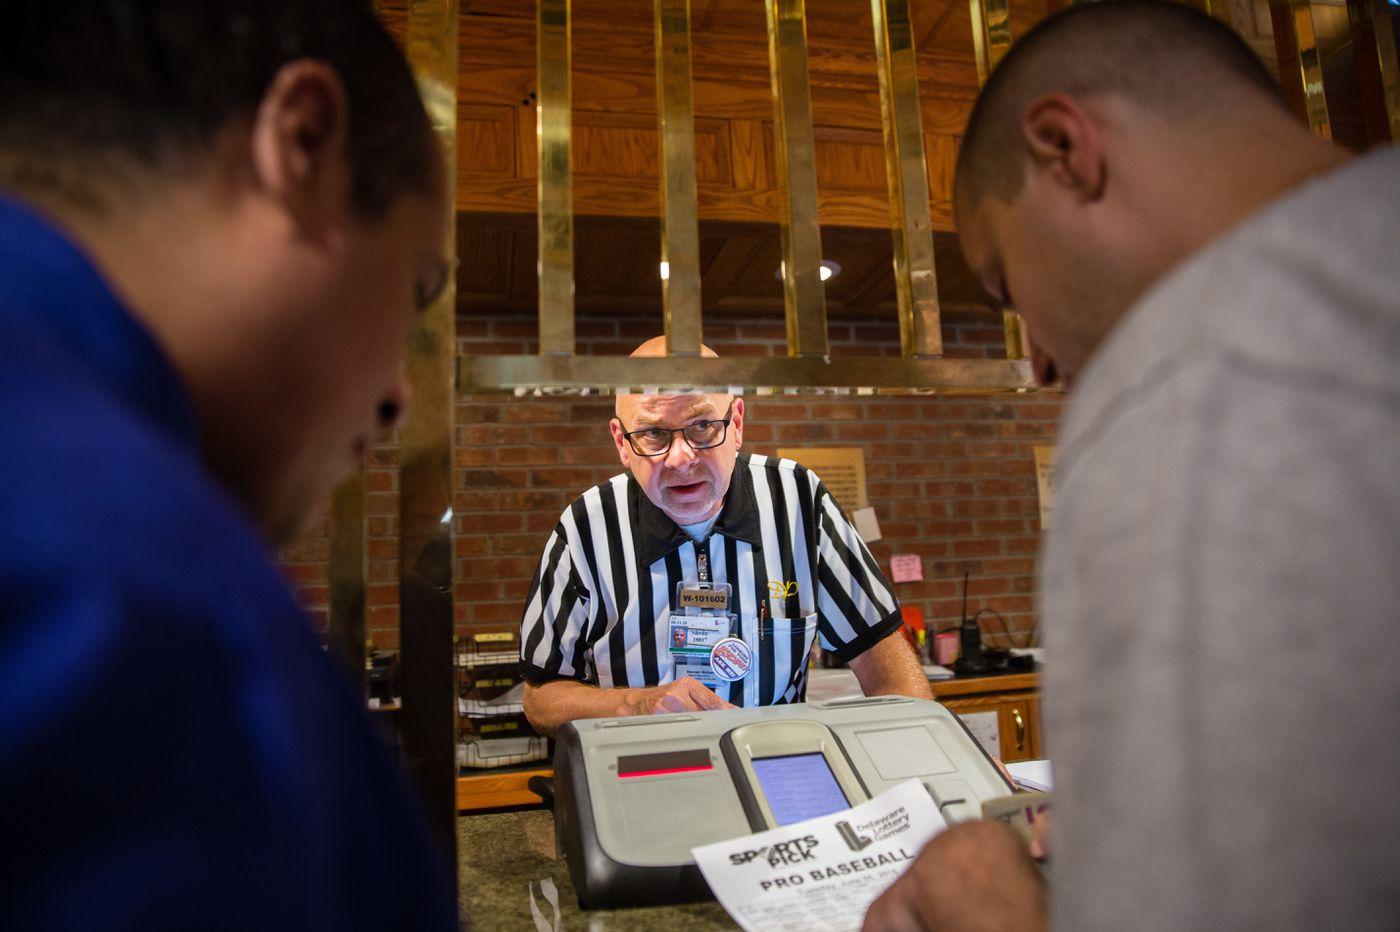 You bettor believe it: Delaware is open for sports betting